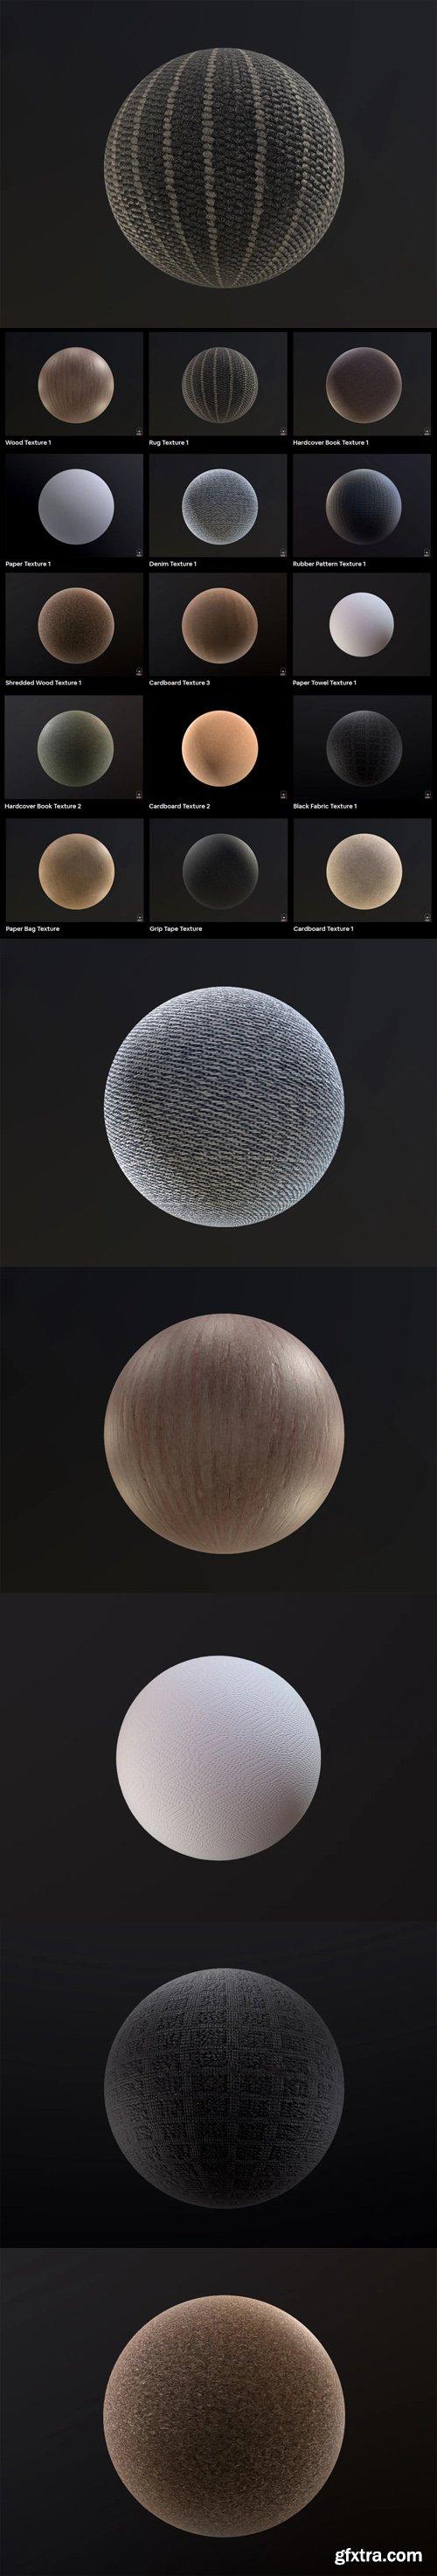 4K Maps Textures TIF Collection [14 Sets]